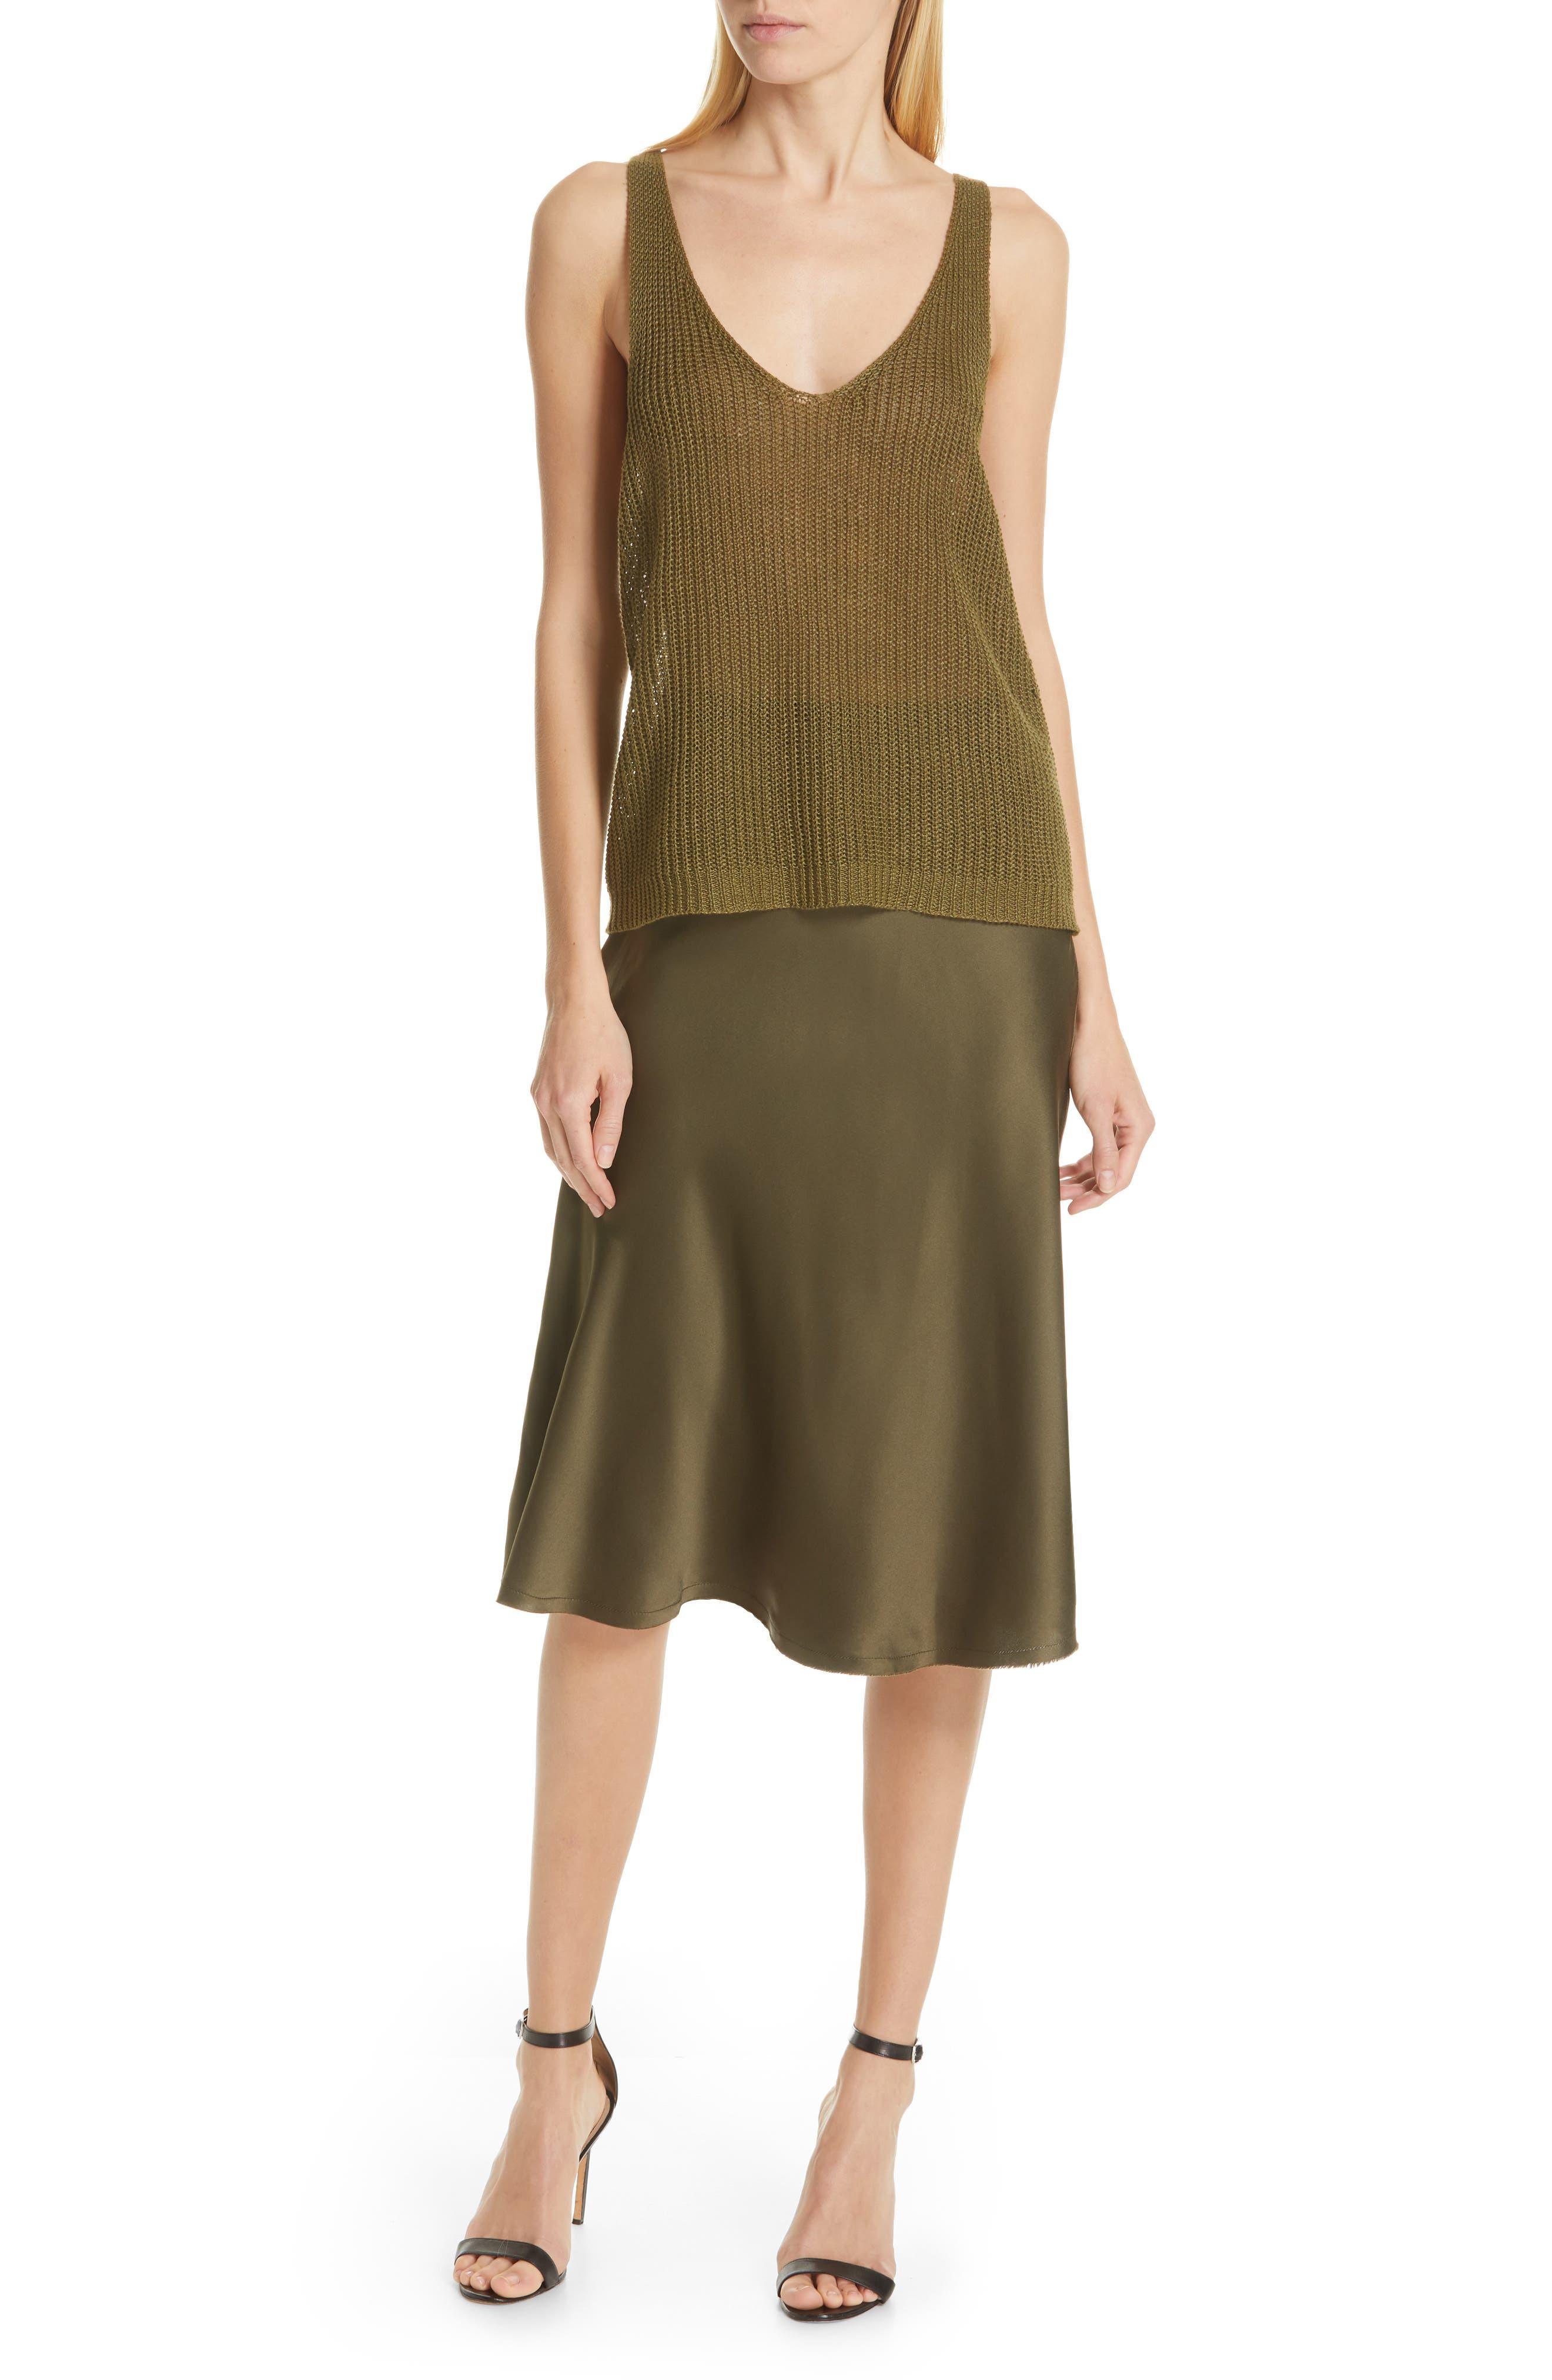 NILI LOTAN, Lane Silk Skirt, Alternate thumbnail 7, color, ARMY GREEN